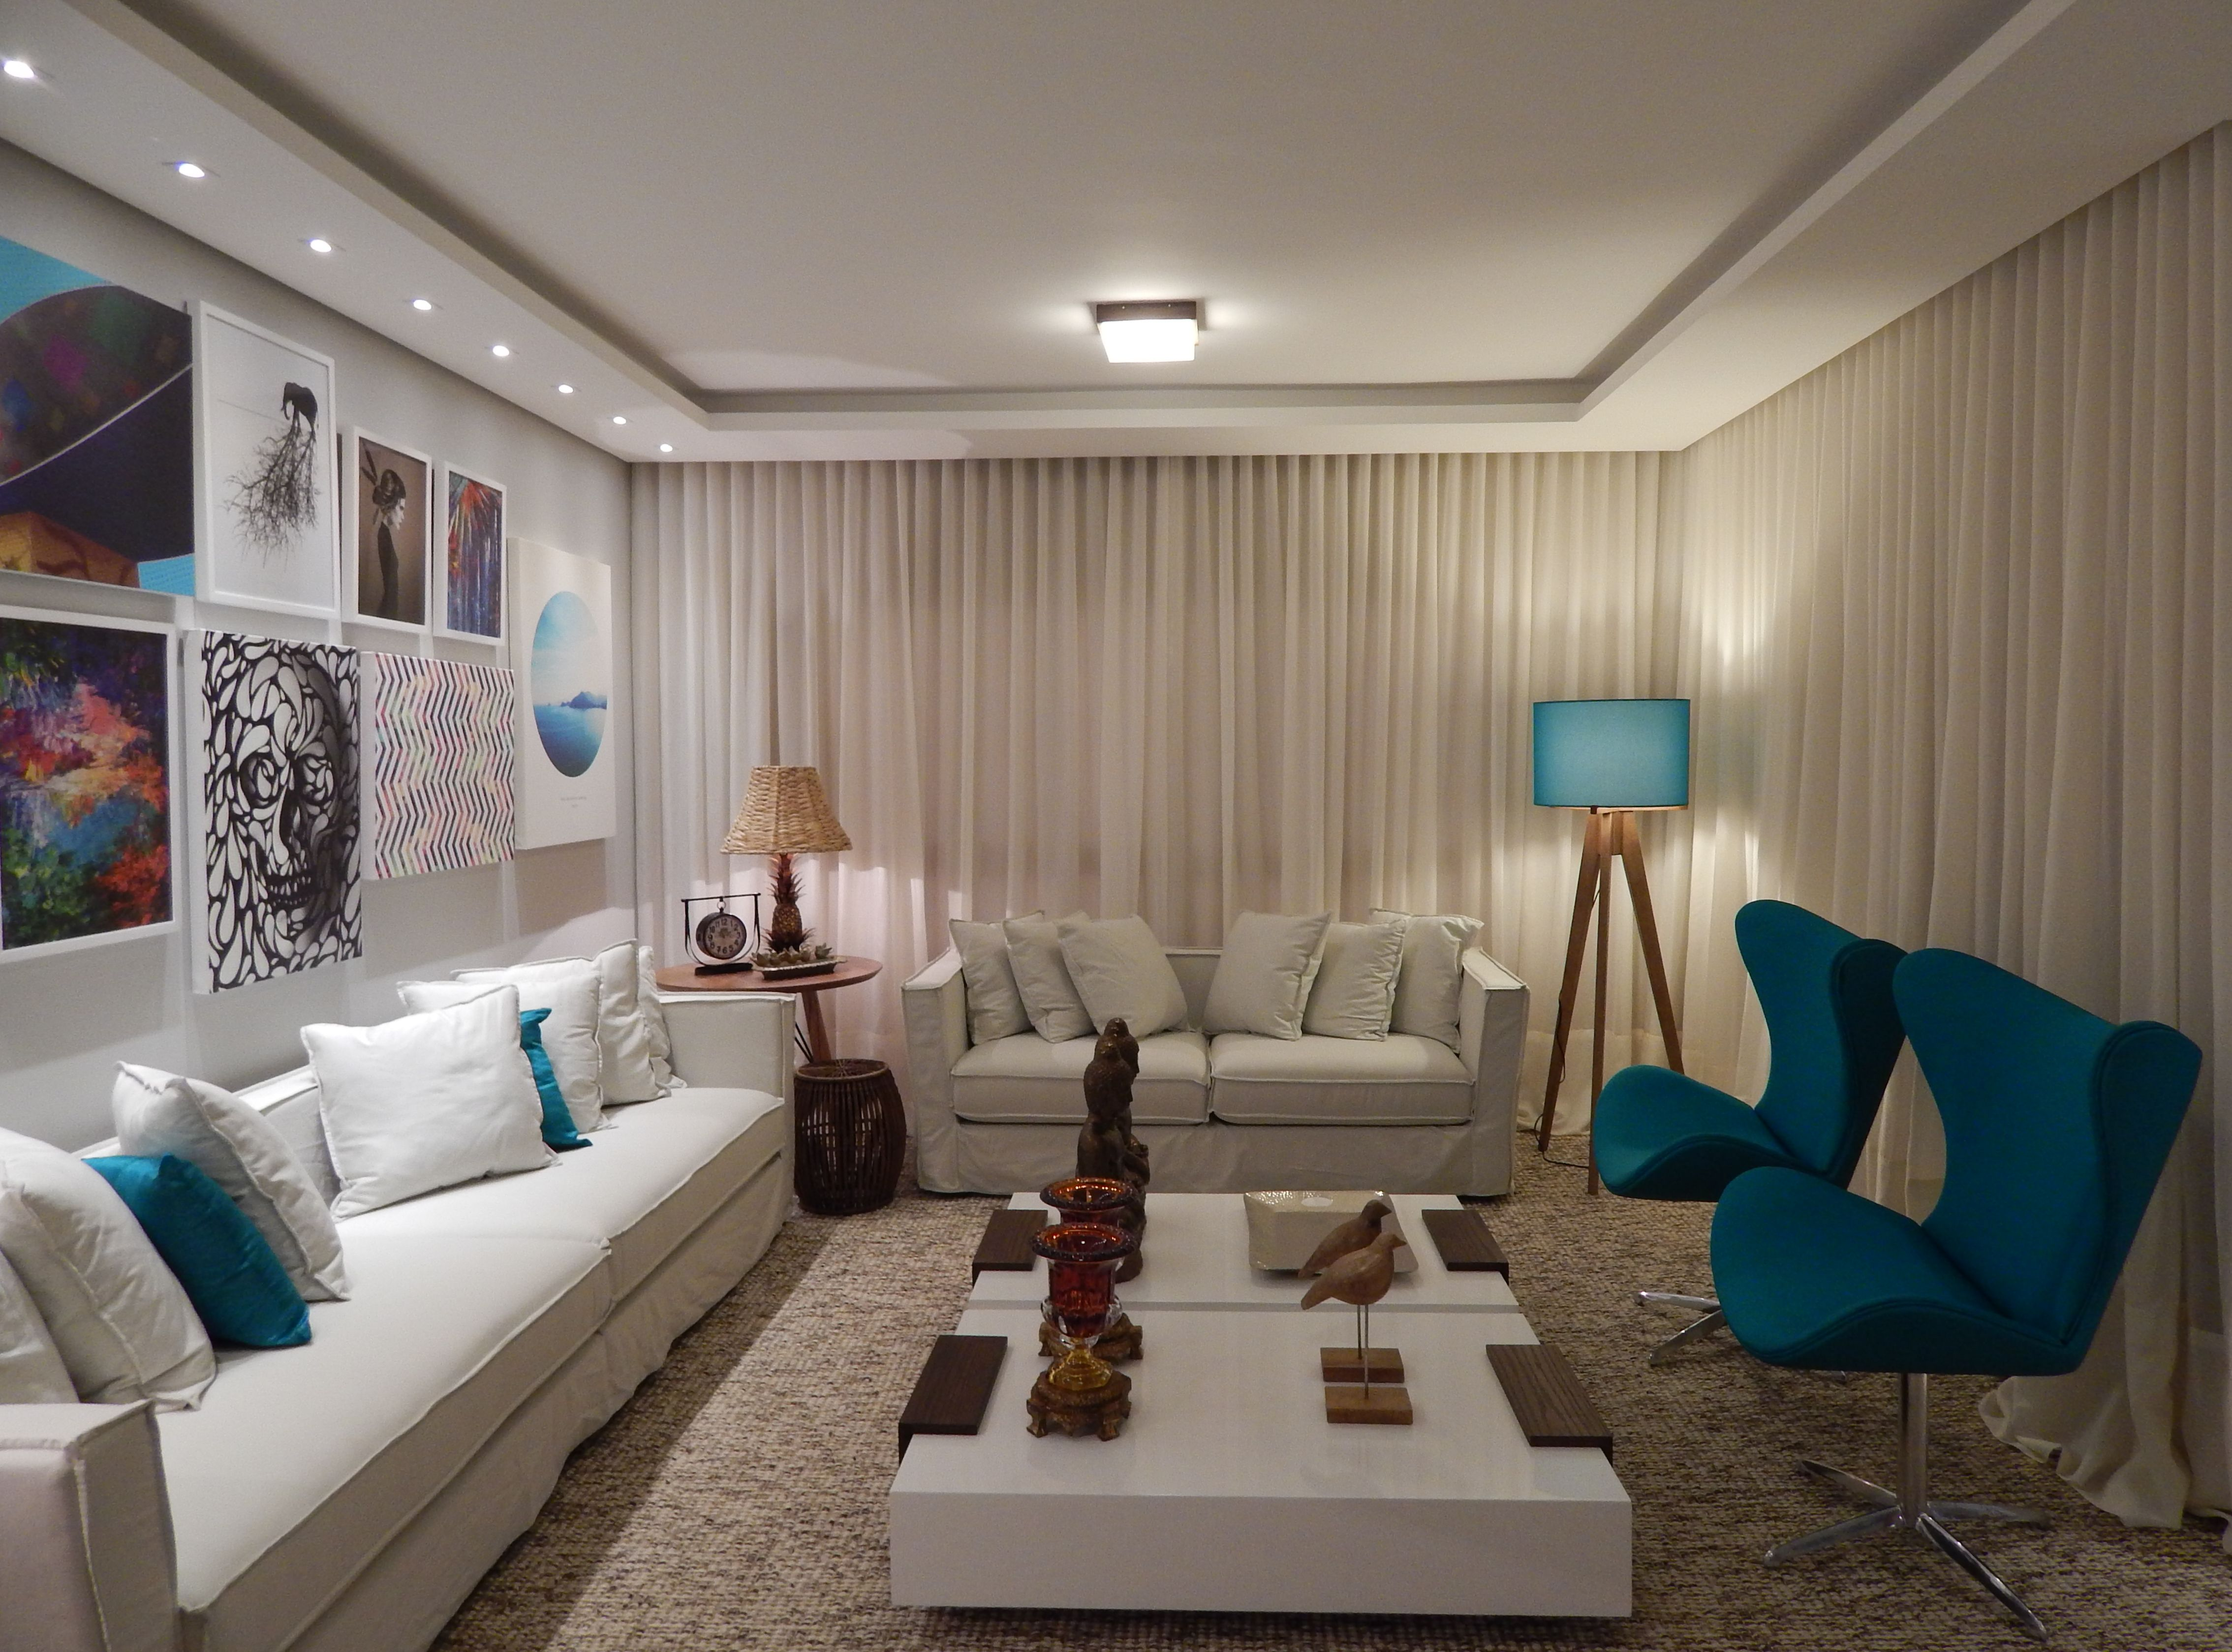 Sala De Estar 2014 Arquiteta Barbara Panassi Azul Turquesa  -> Abajur Para Decoracao De Sala